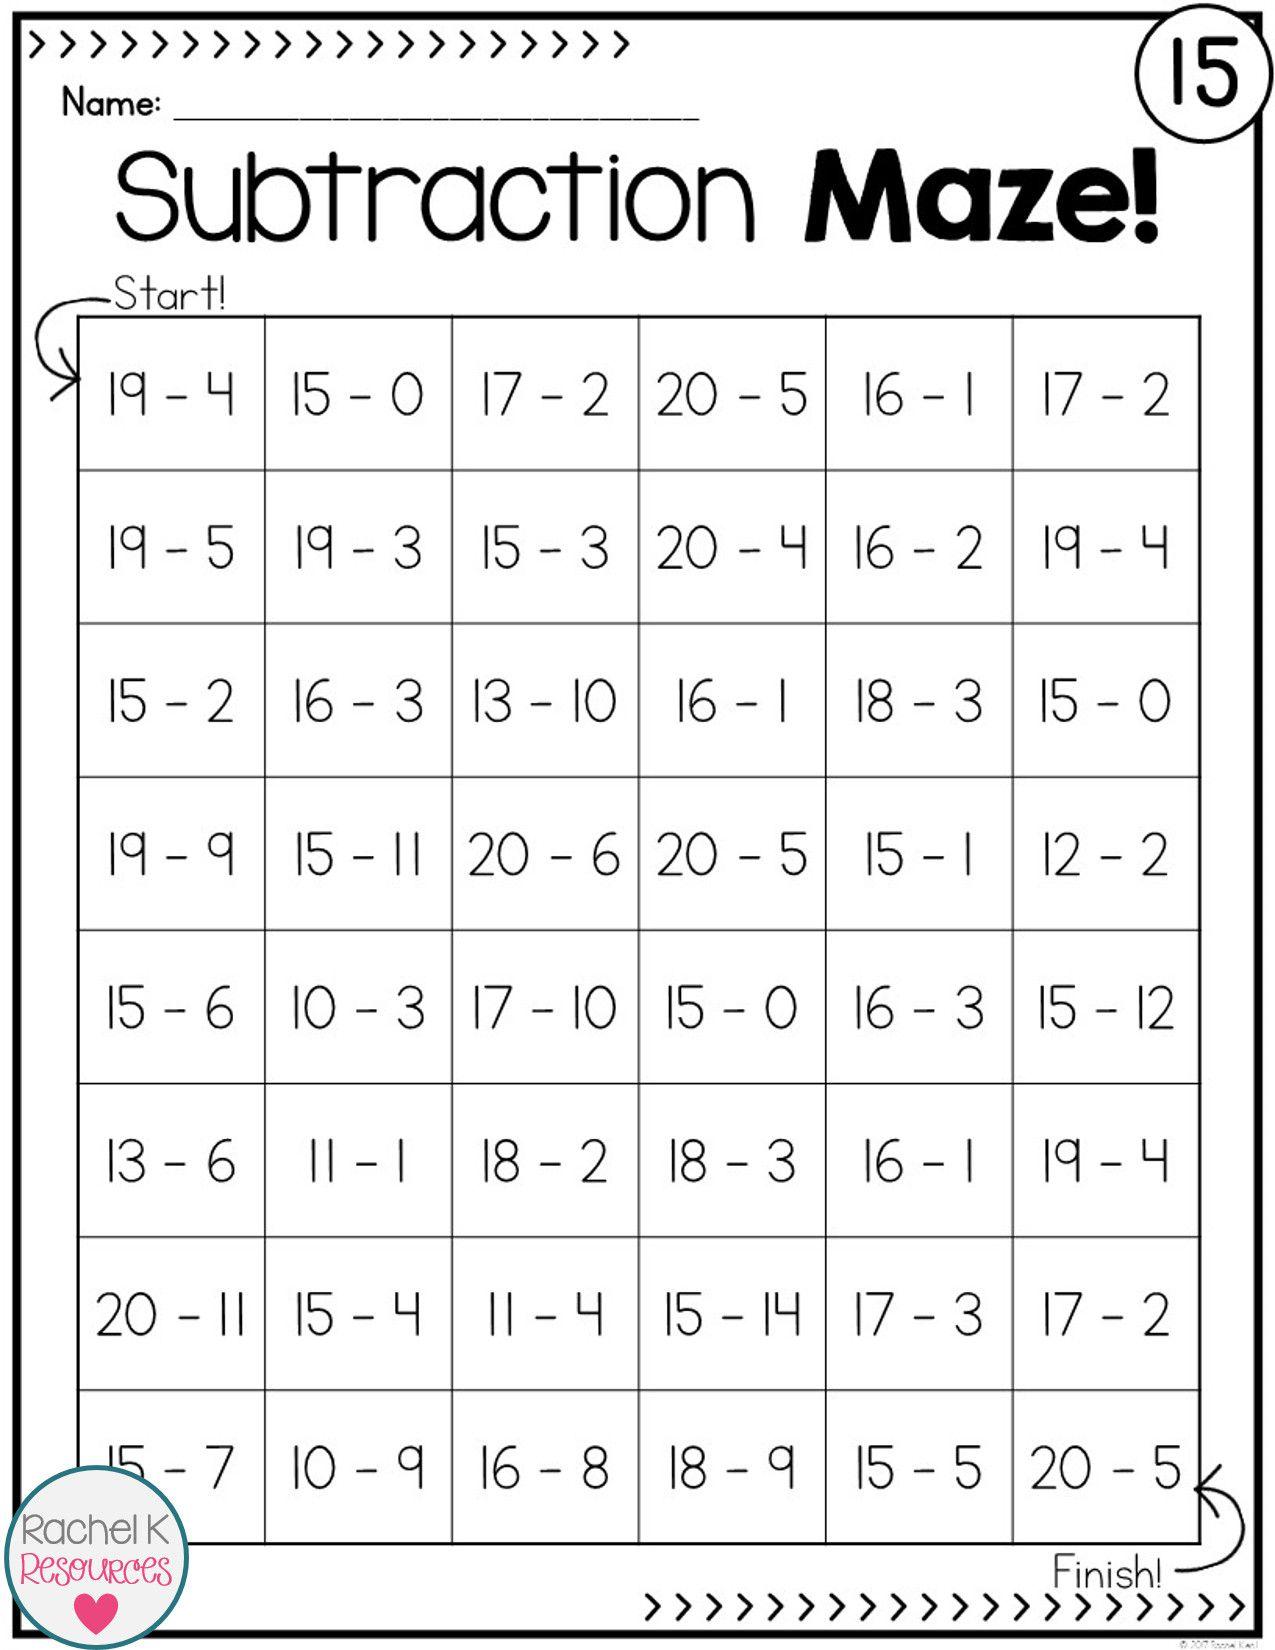 2 Math Maze Worksheets Subtraction Practice Mazes Fun Math Worksheets Subtraction Practice Subtraction Worksheets